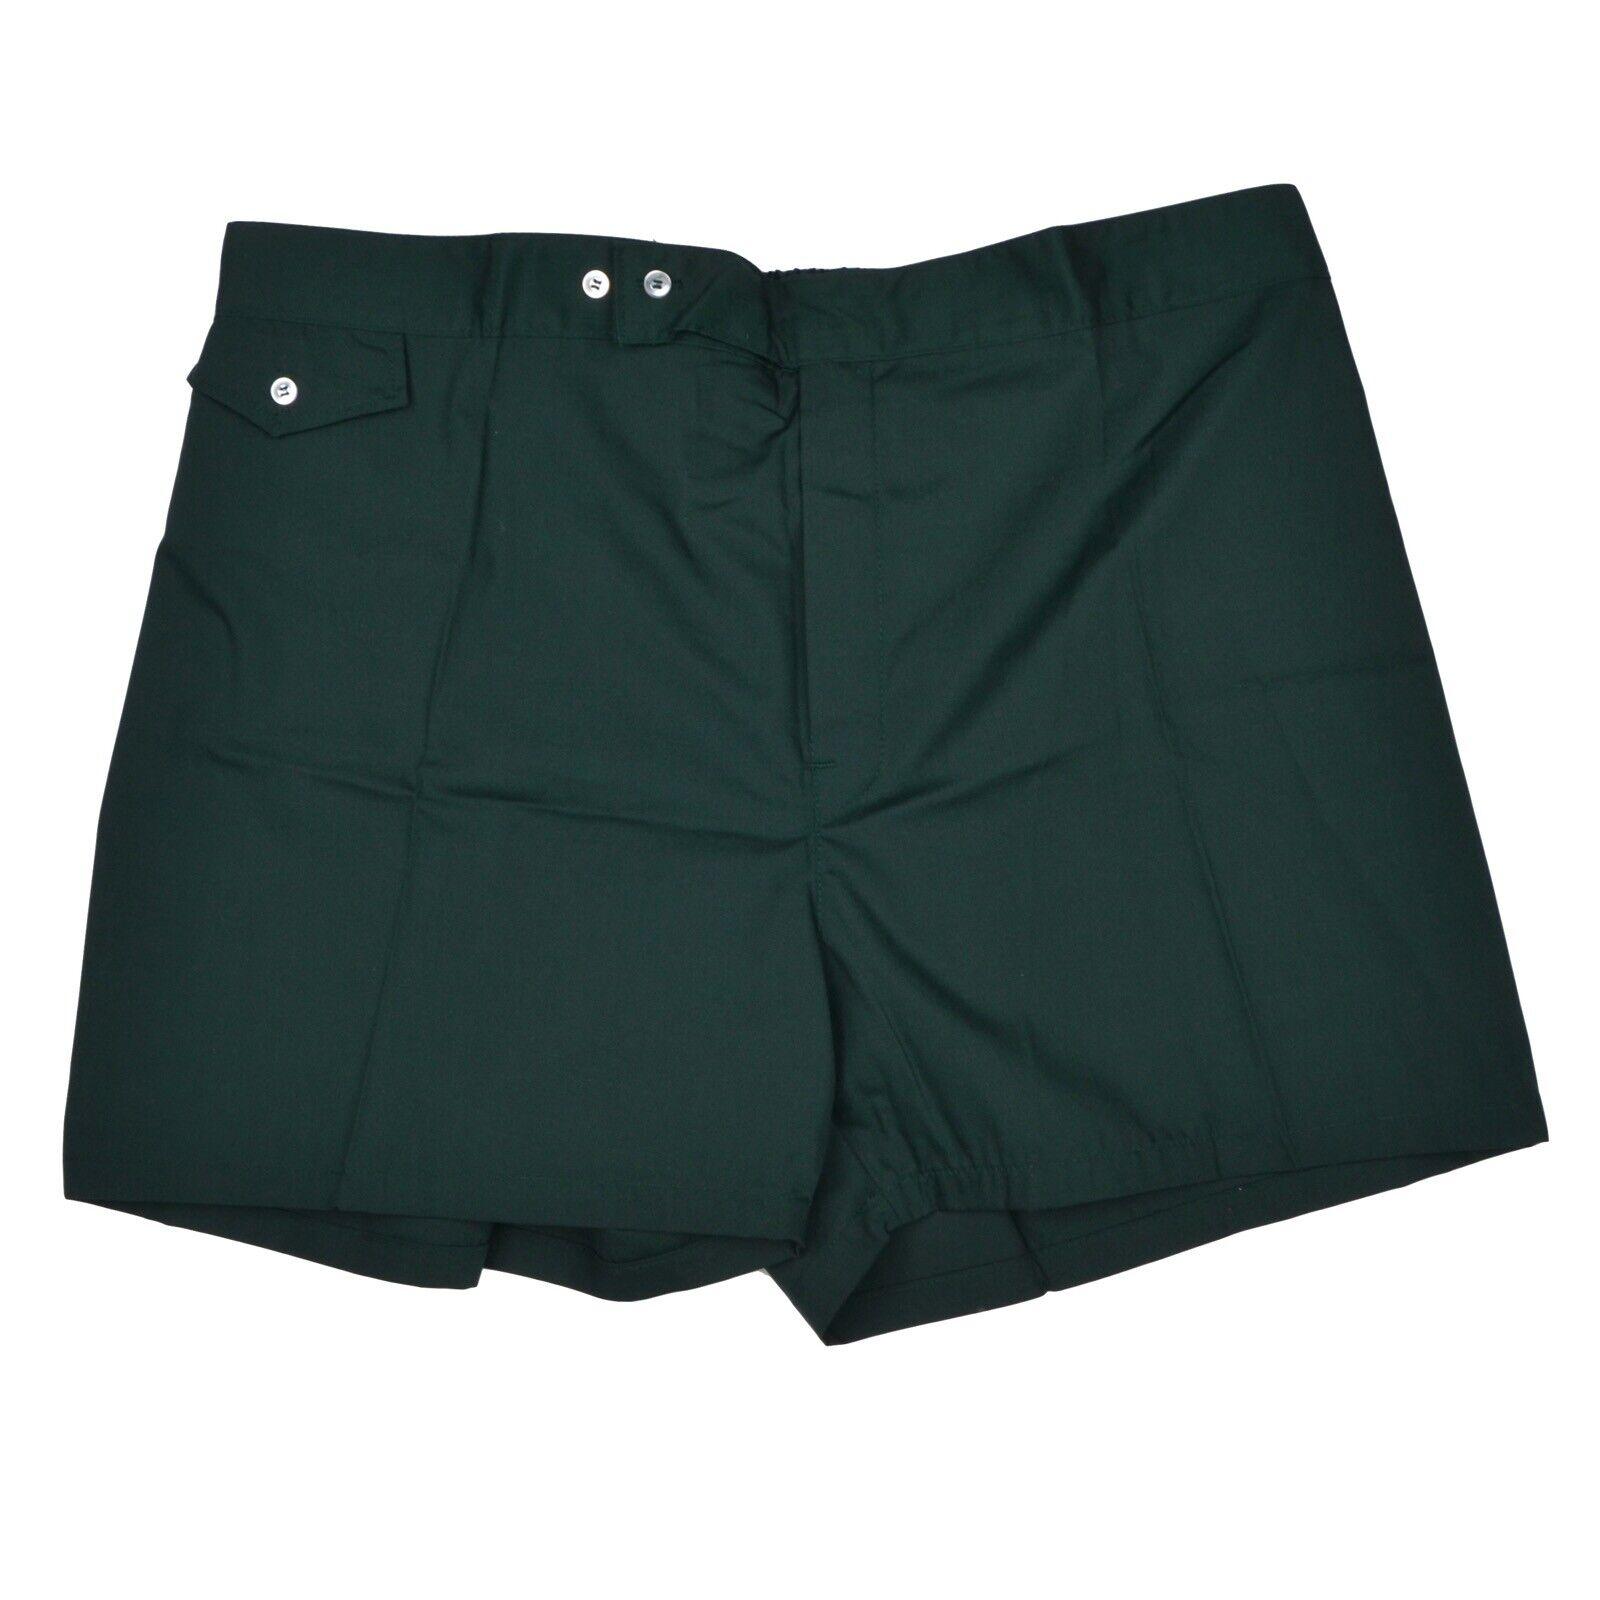 NEU VINTAGE Badehosen Swim Shorts Gr XL Made in USA green Green Baumwolle Polyest